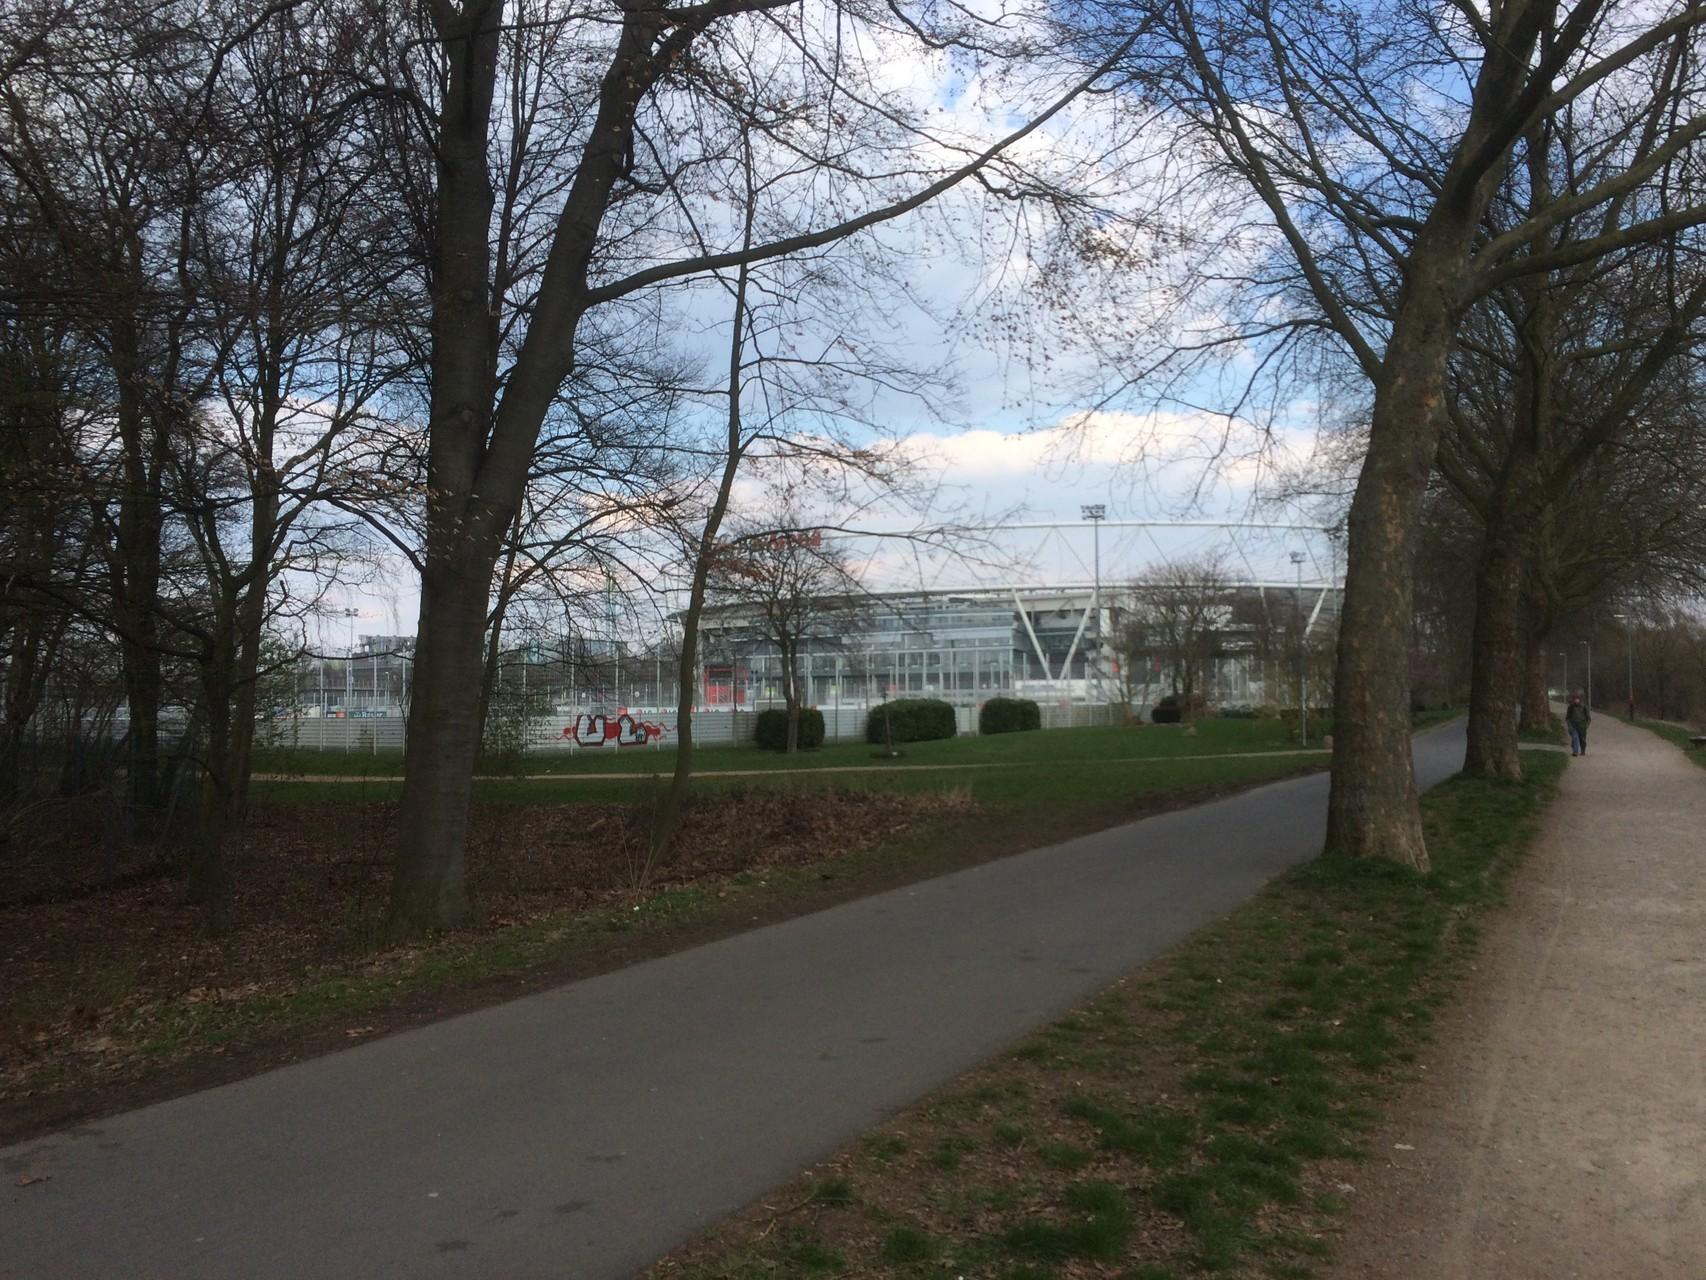 Permanenter Wanderweg in Leverkusen/Ostersonntag 05.04.2015  (Fotograf: K.Kra.)